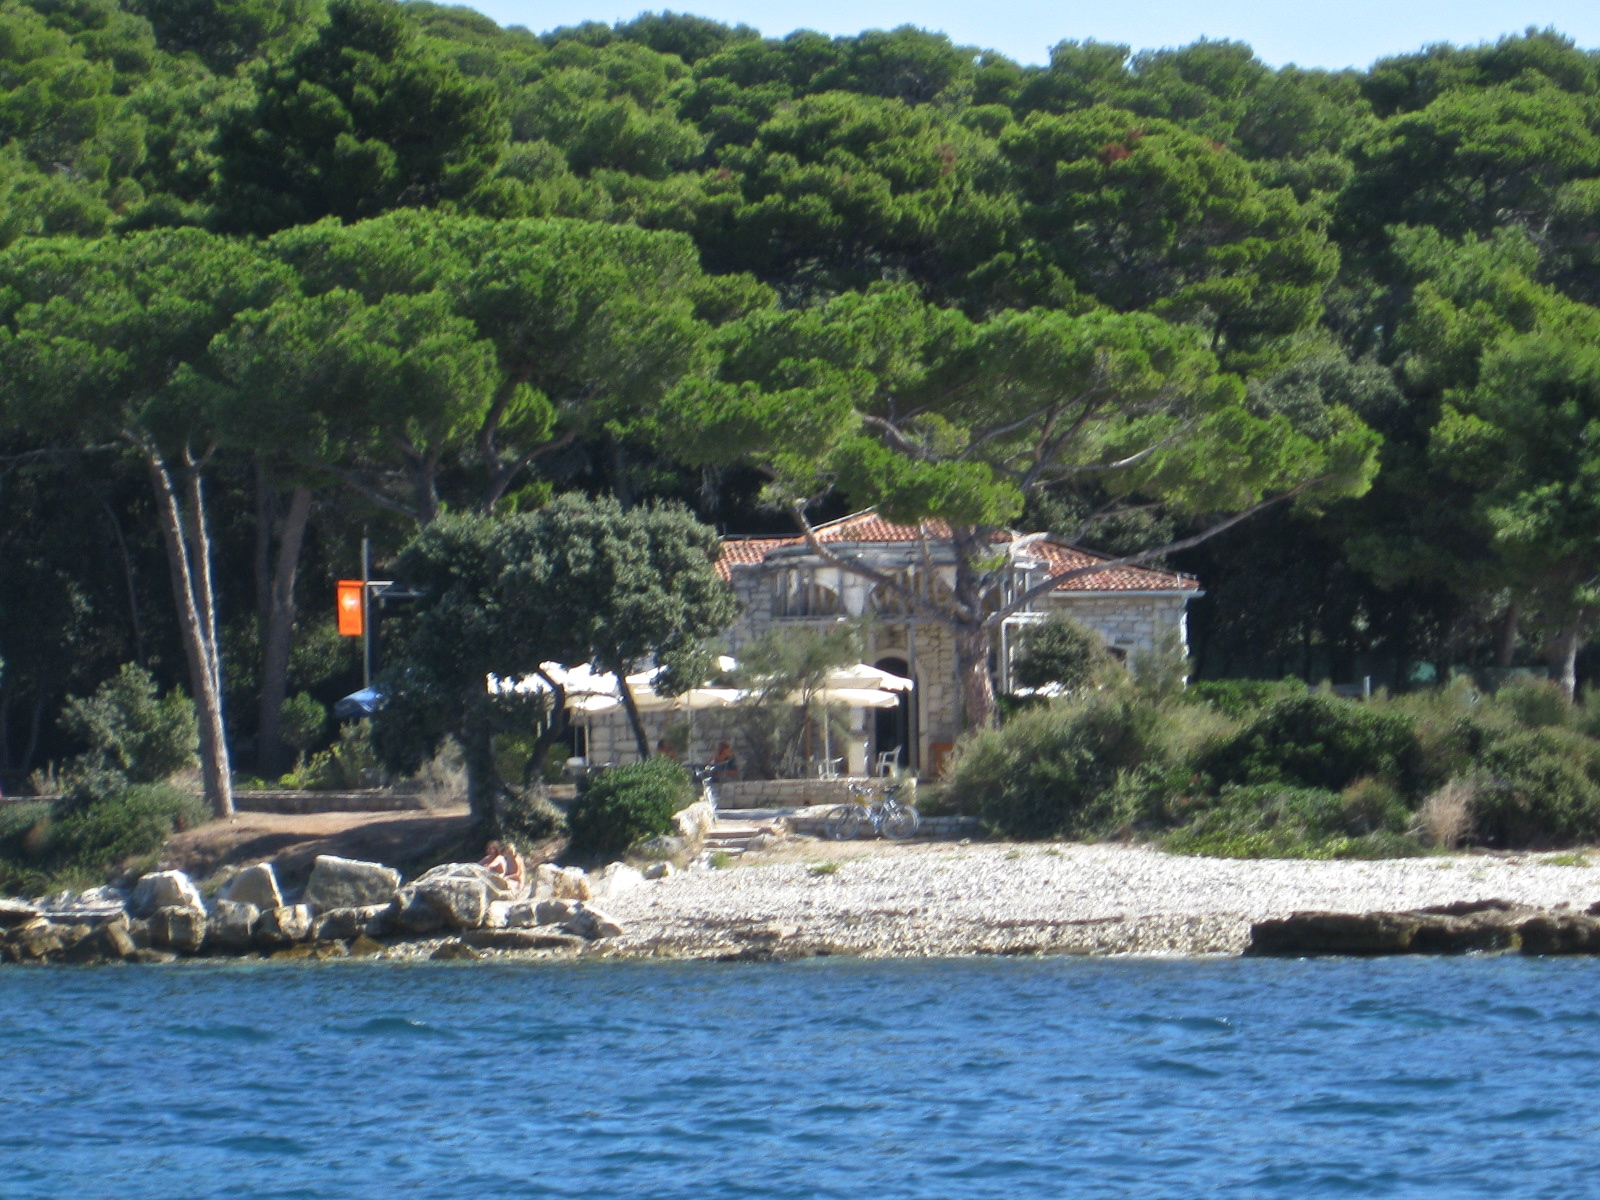 island near Rovinj, Croatia